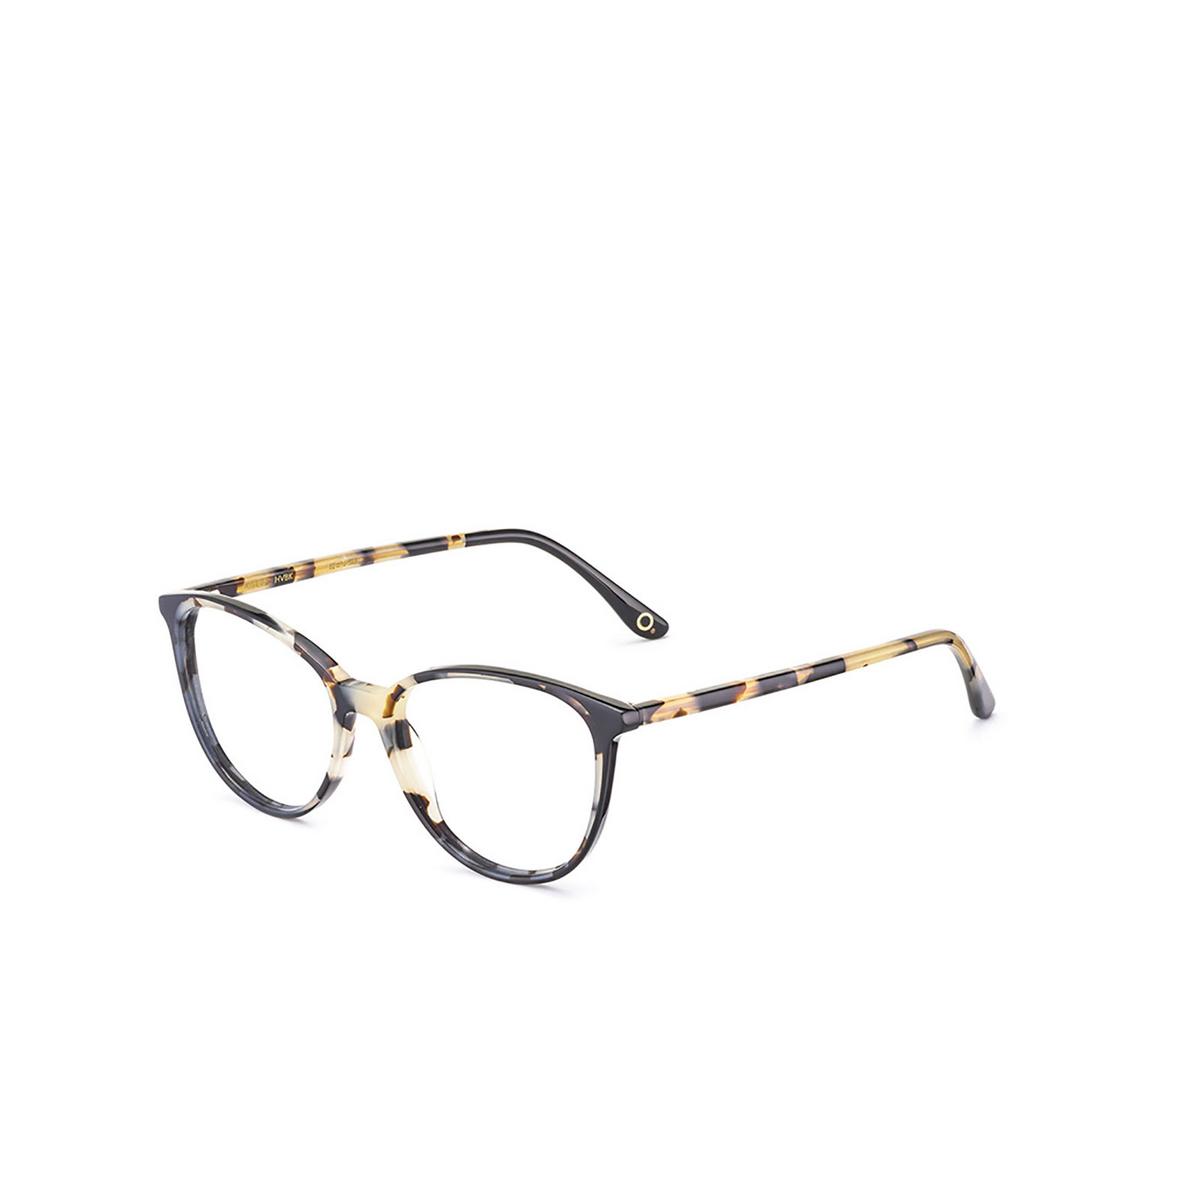 Etnia Barcelona® Butterfly Eyeglasses: Marie color Hvbk - three-quarters view.